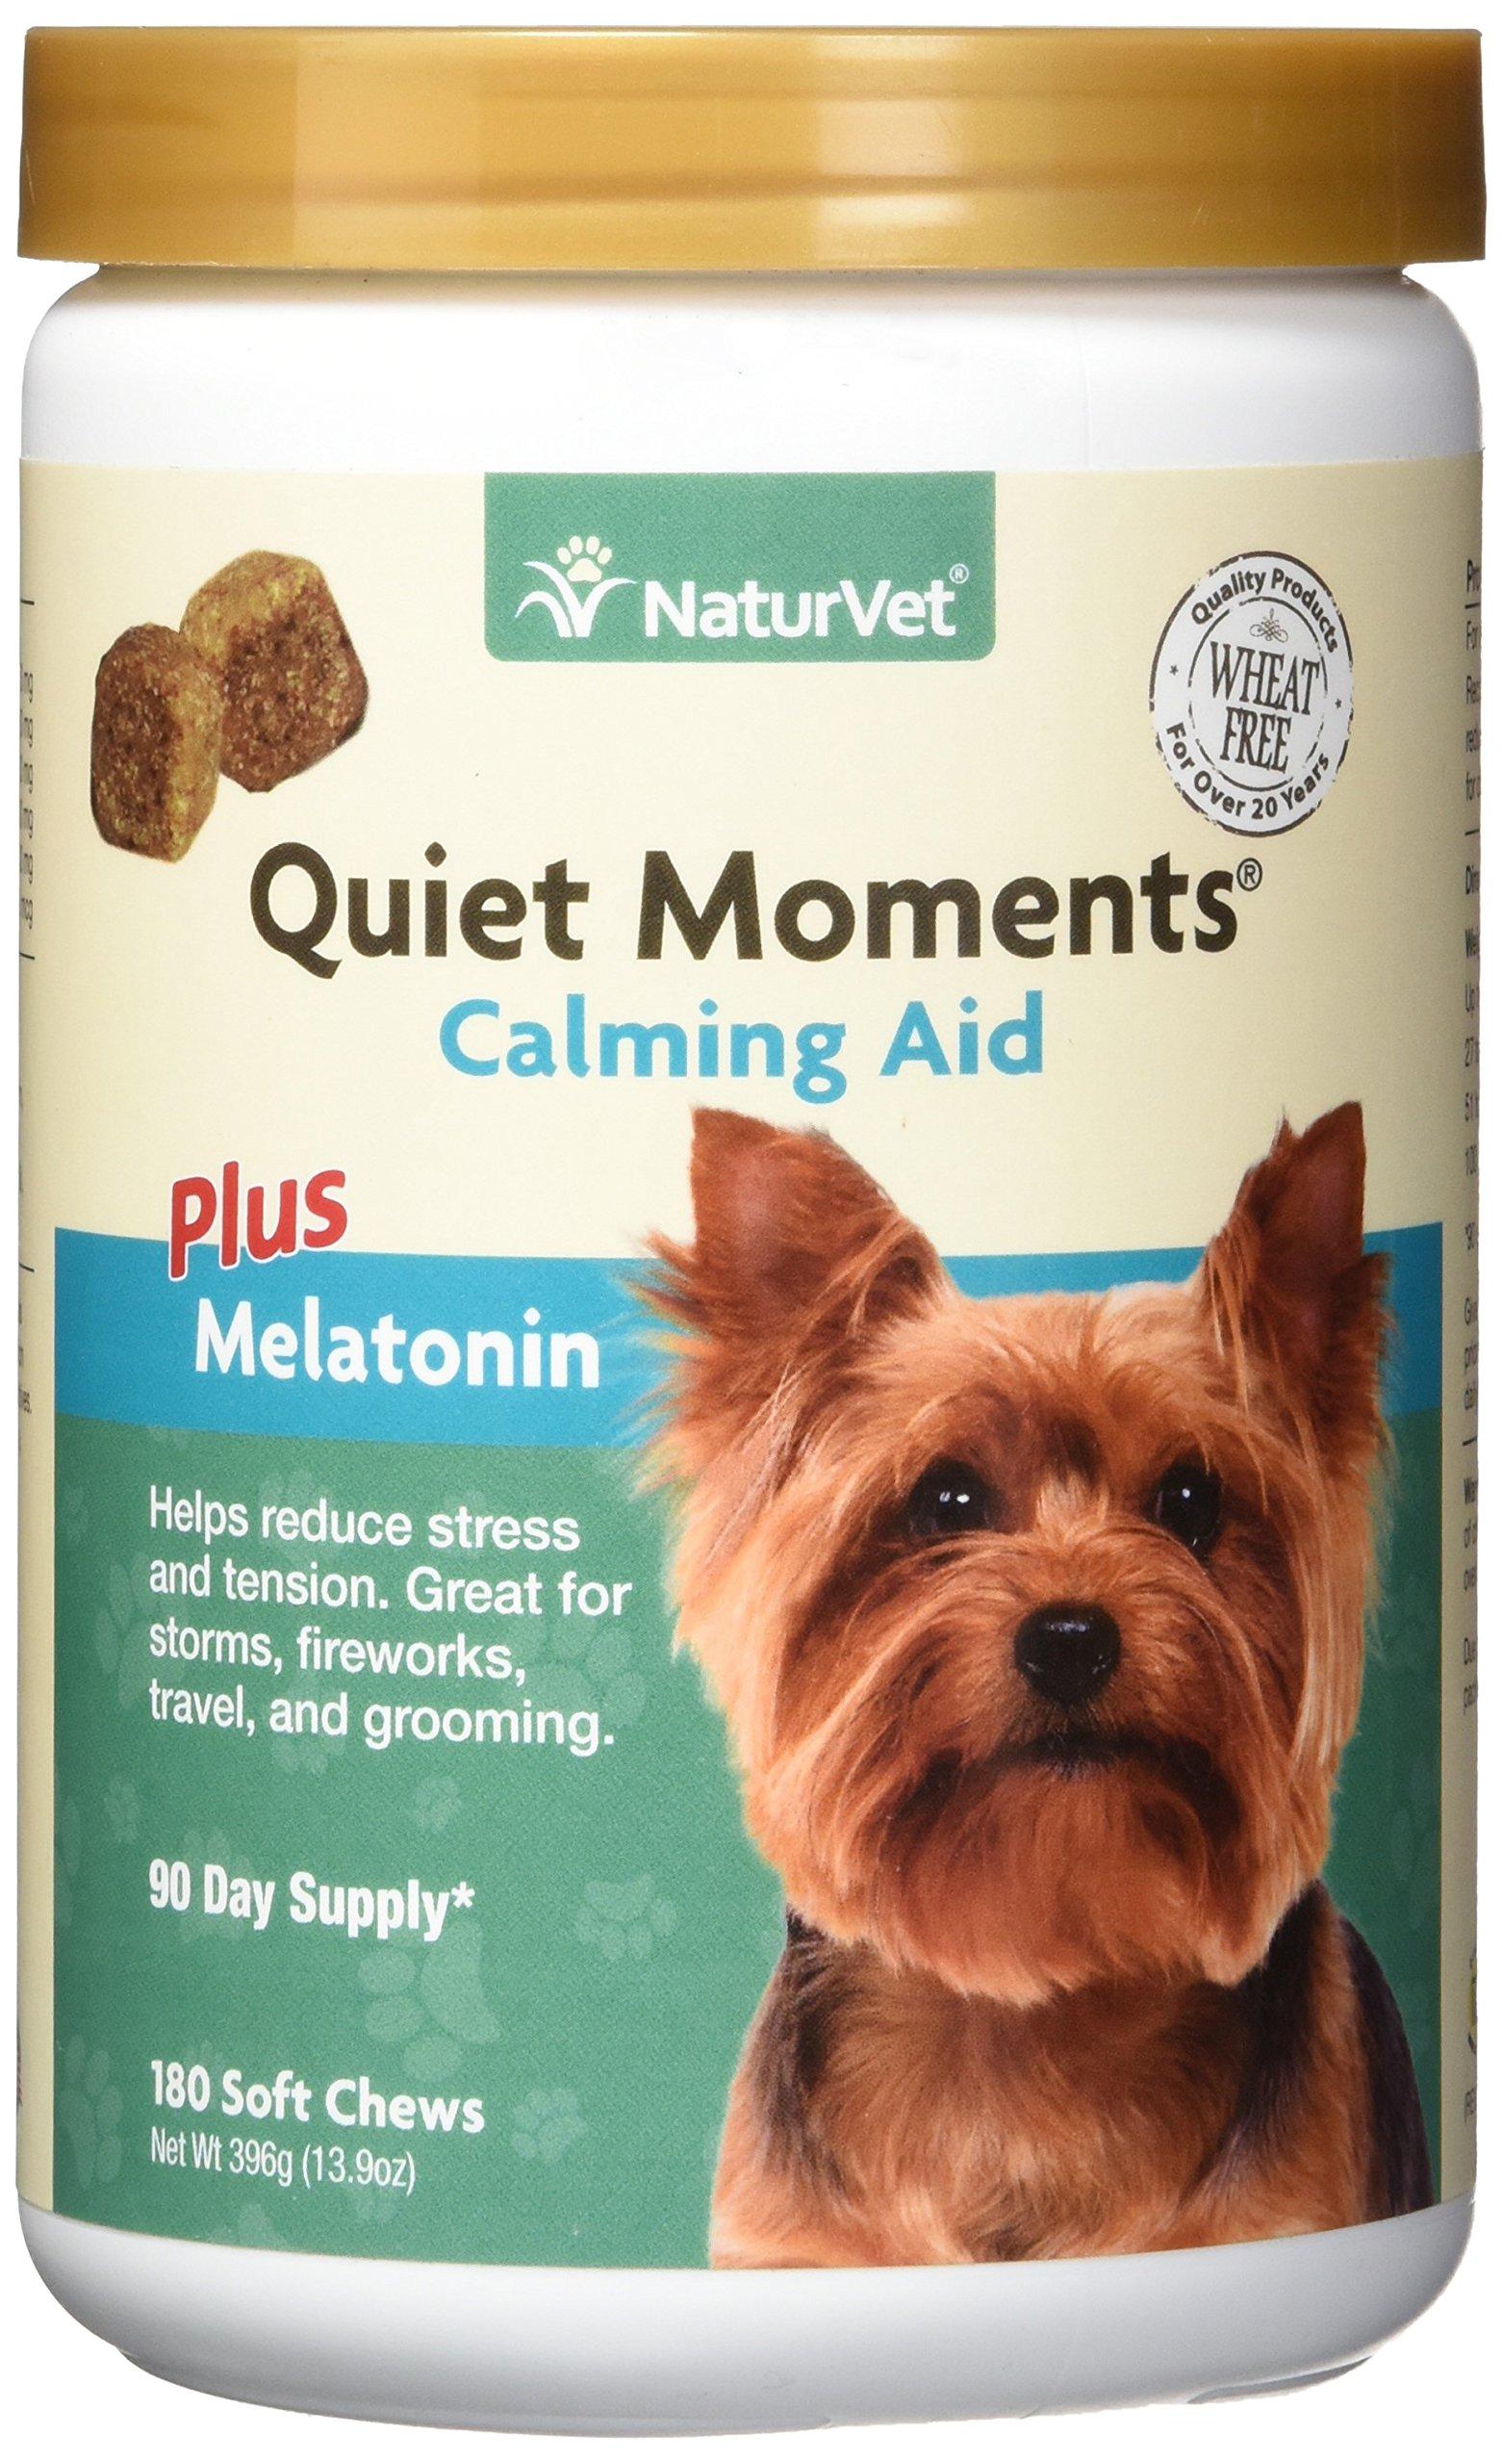 NaturVet Quiet Moments Calming Aid Plus Melatonin 180 Soft Chews 13.9OZ